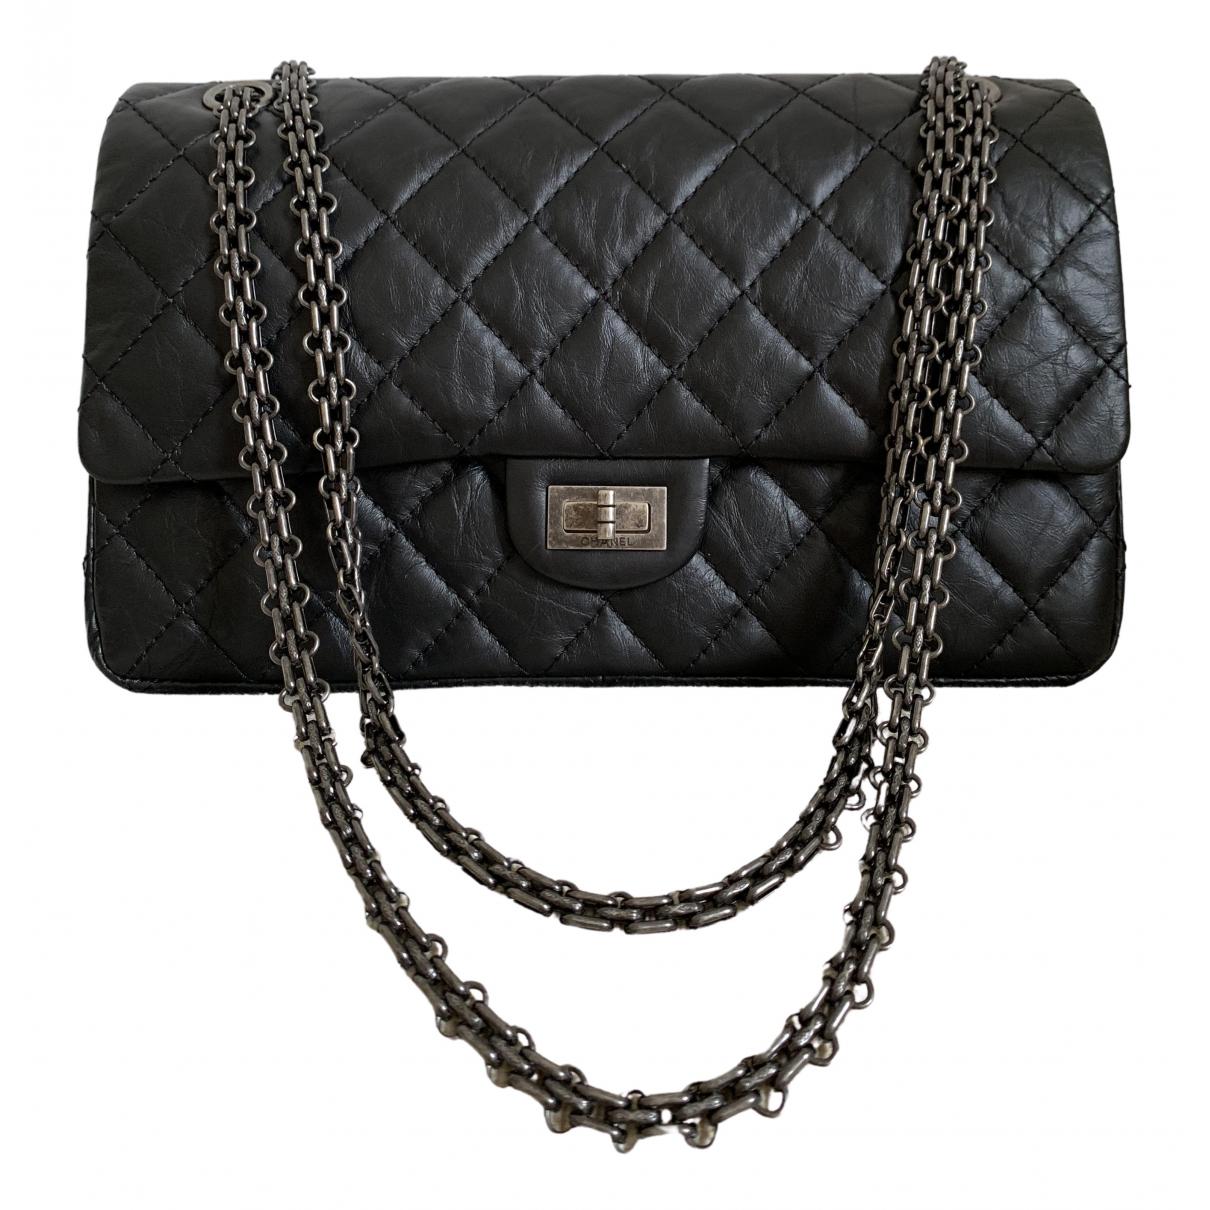 Chanel 2.55 Black Leather handbag for Women \N